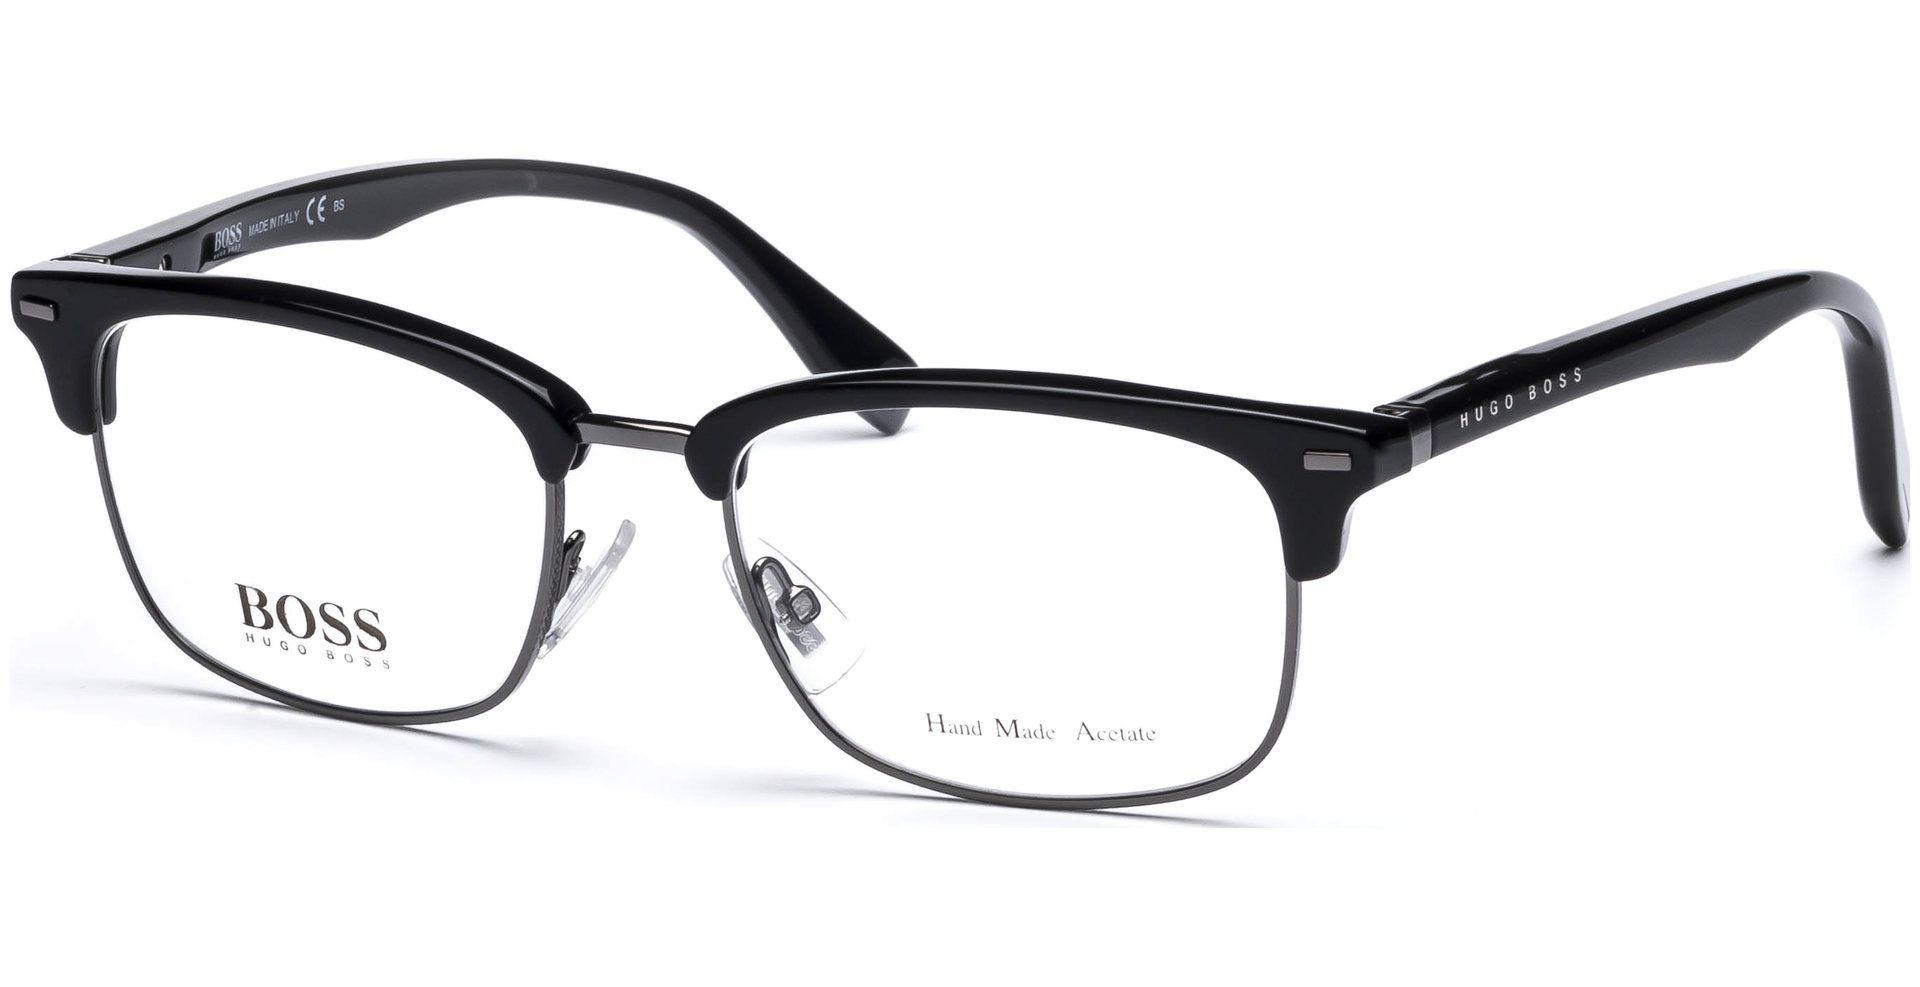 Boss Hugo Boss Bo0711 W3h 5218 Bkdkrut Blk Von Lensbest Mit Bildern Herren Brillen Hugo Boss Herrin